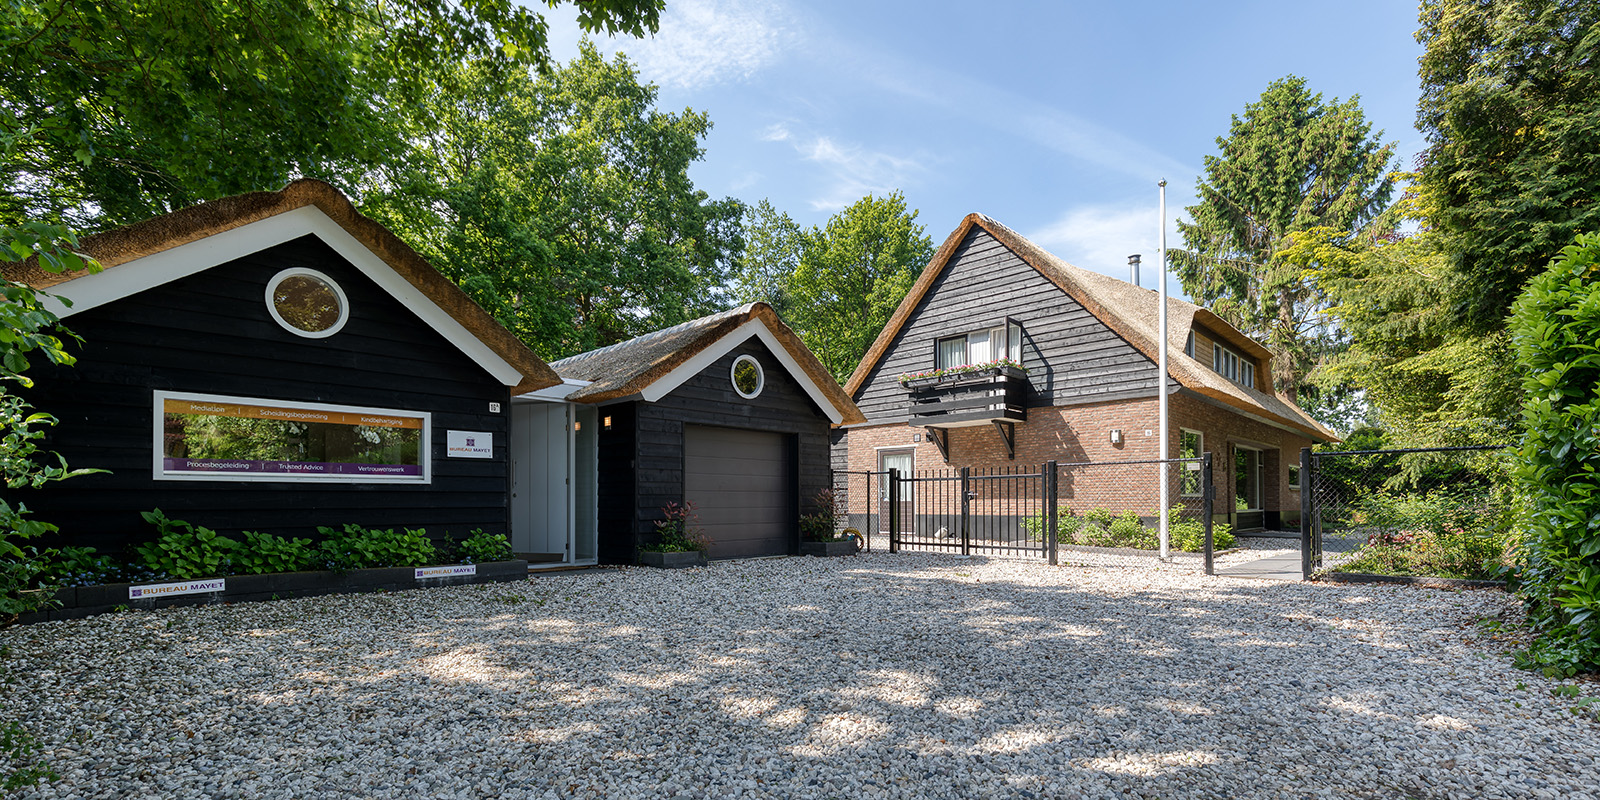 villa met rieten dak, vvr architecten, the art of living